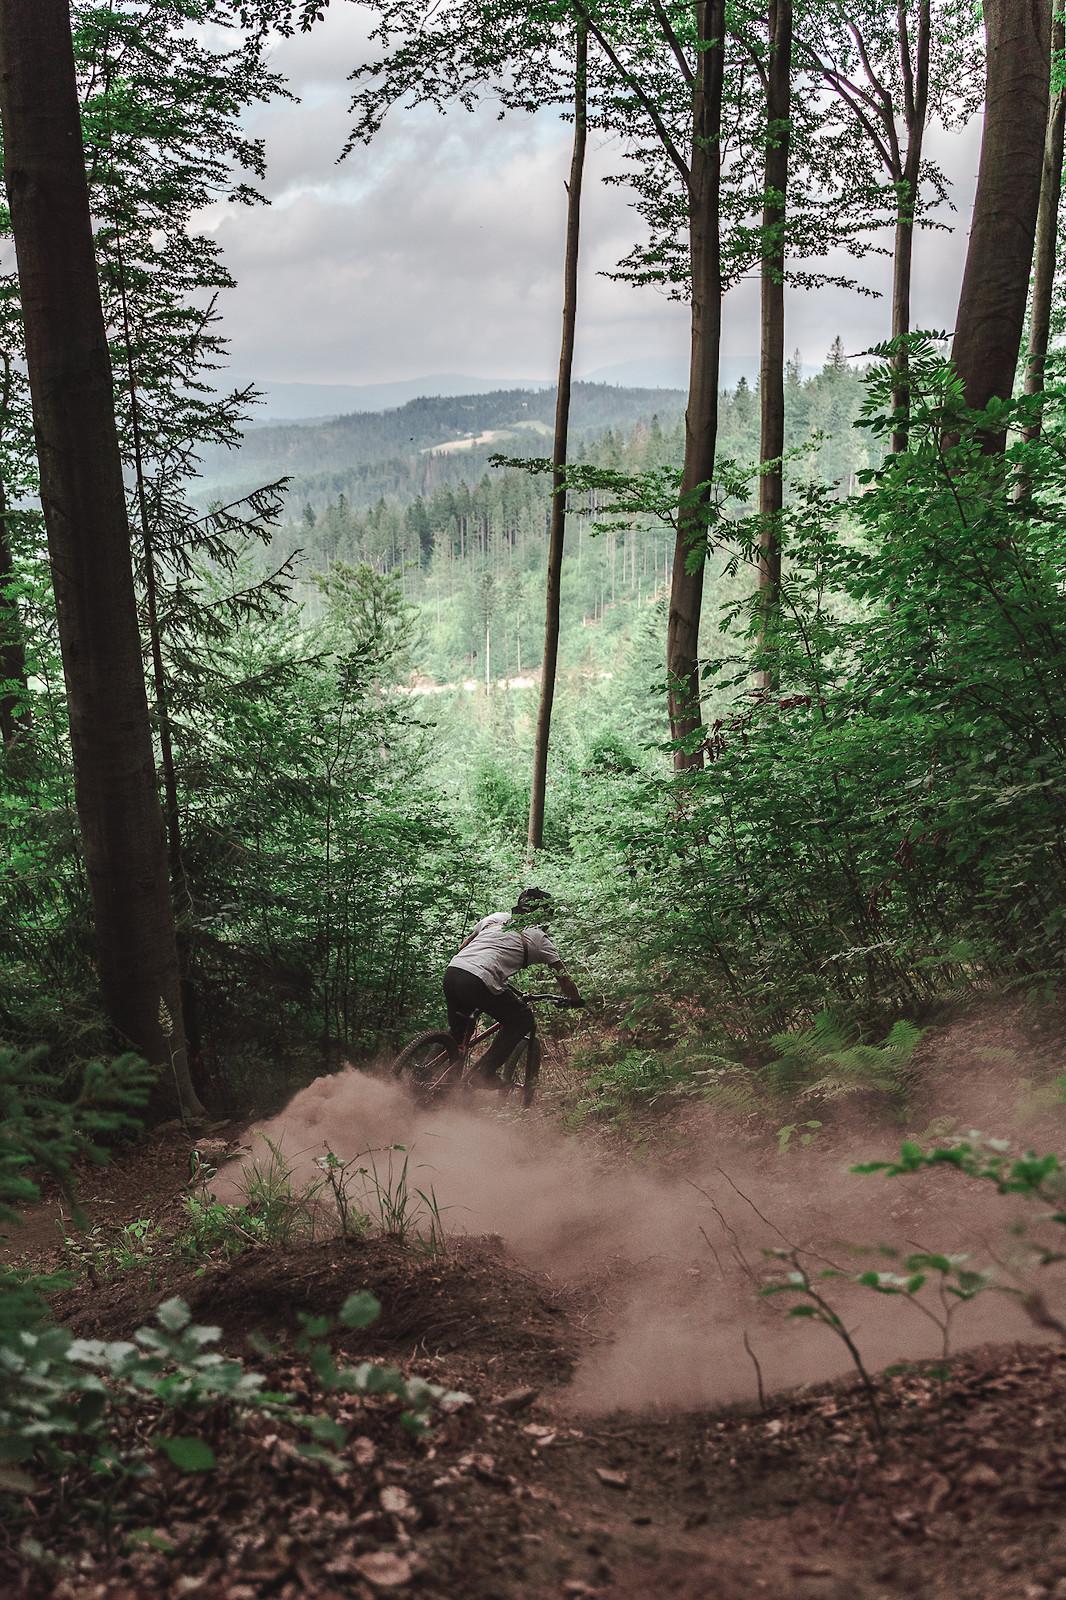 dust & mountains - Banan - Mountain Biking Pictures - Vital MTB